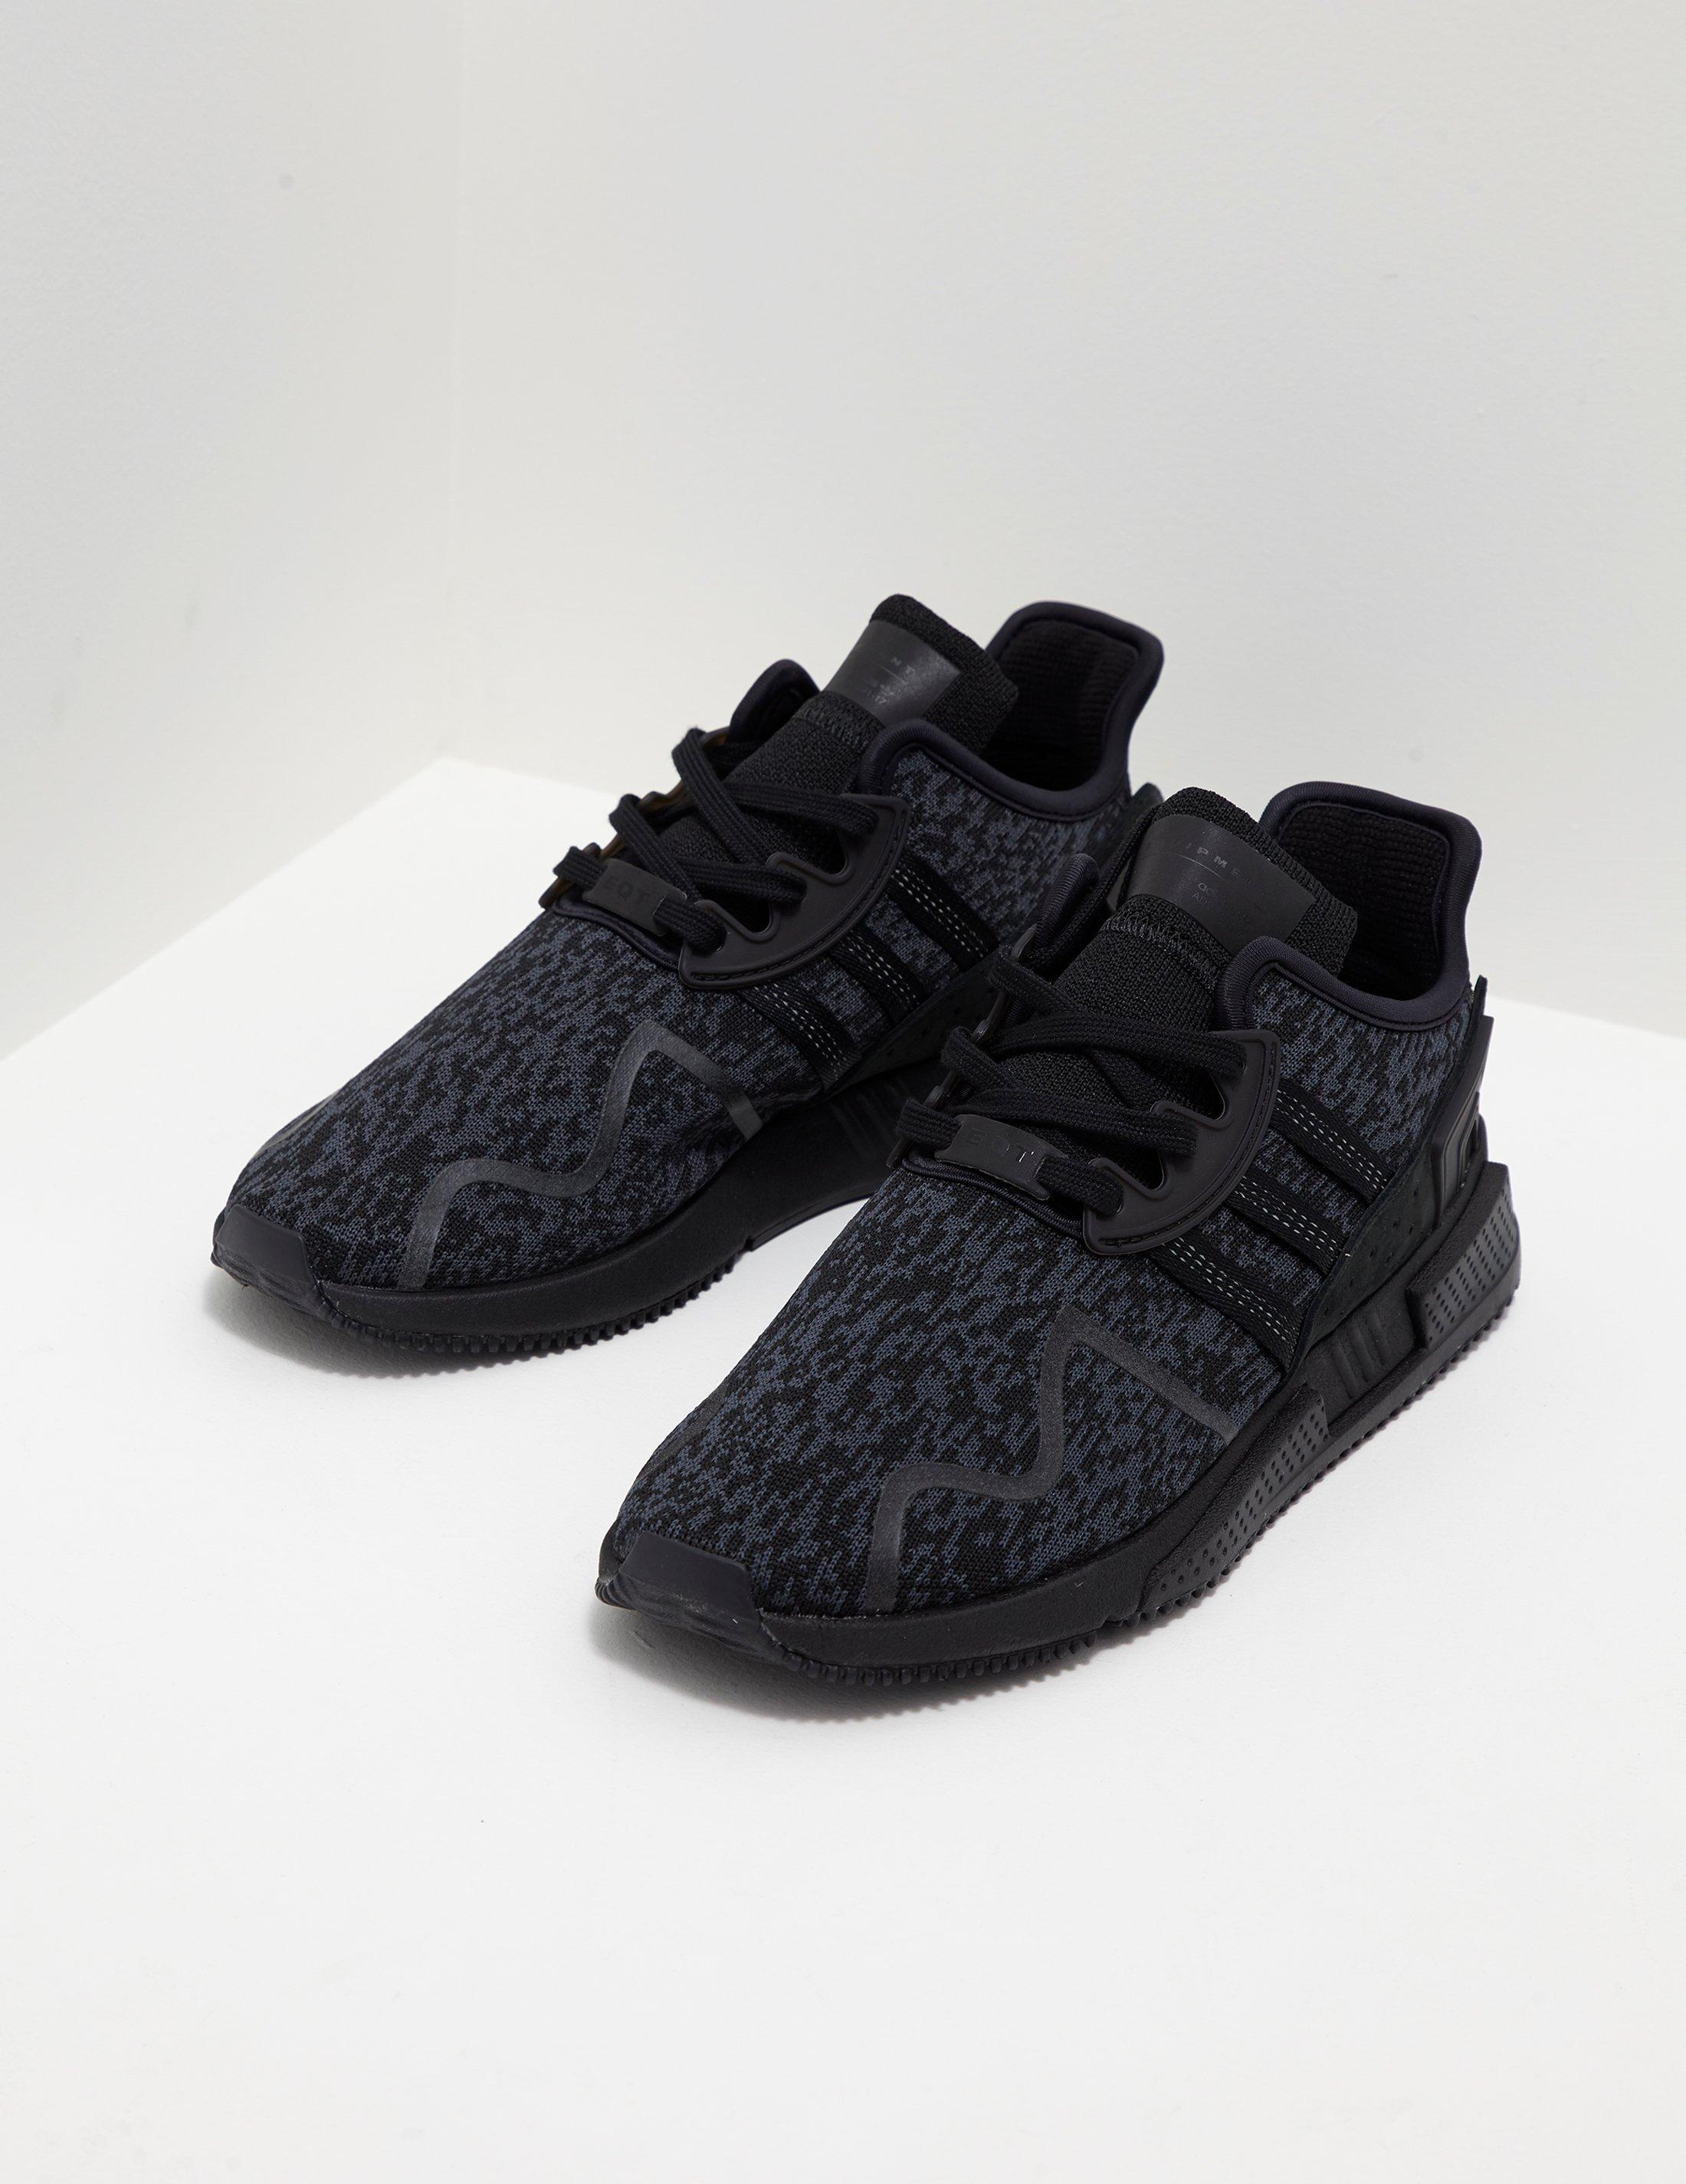 adidas originals eqt cushion adv triple black